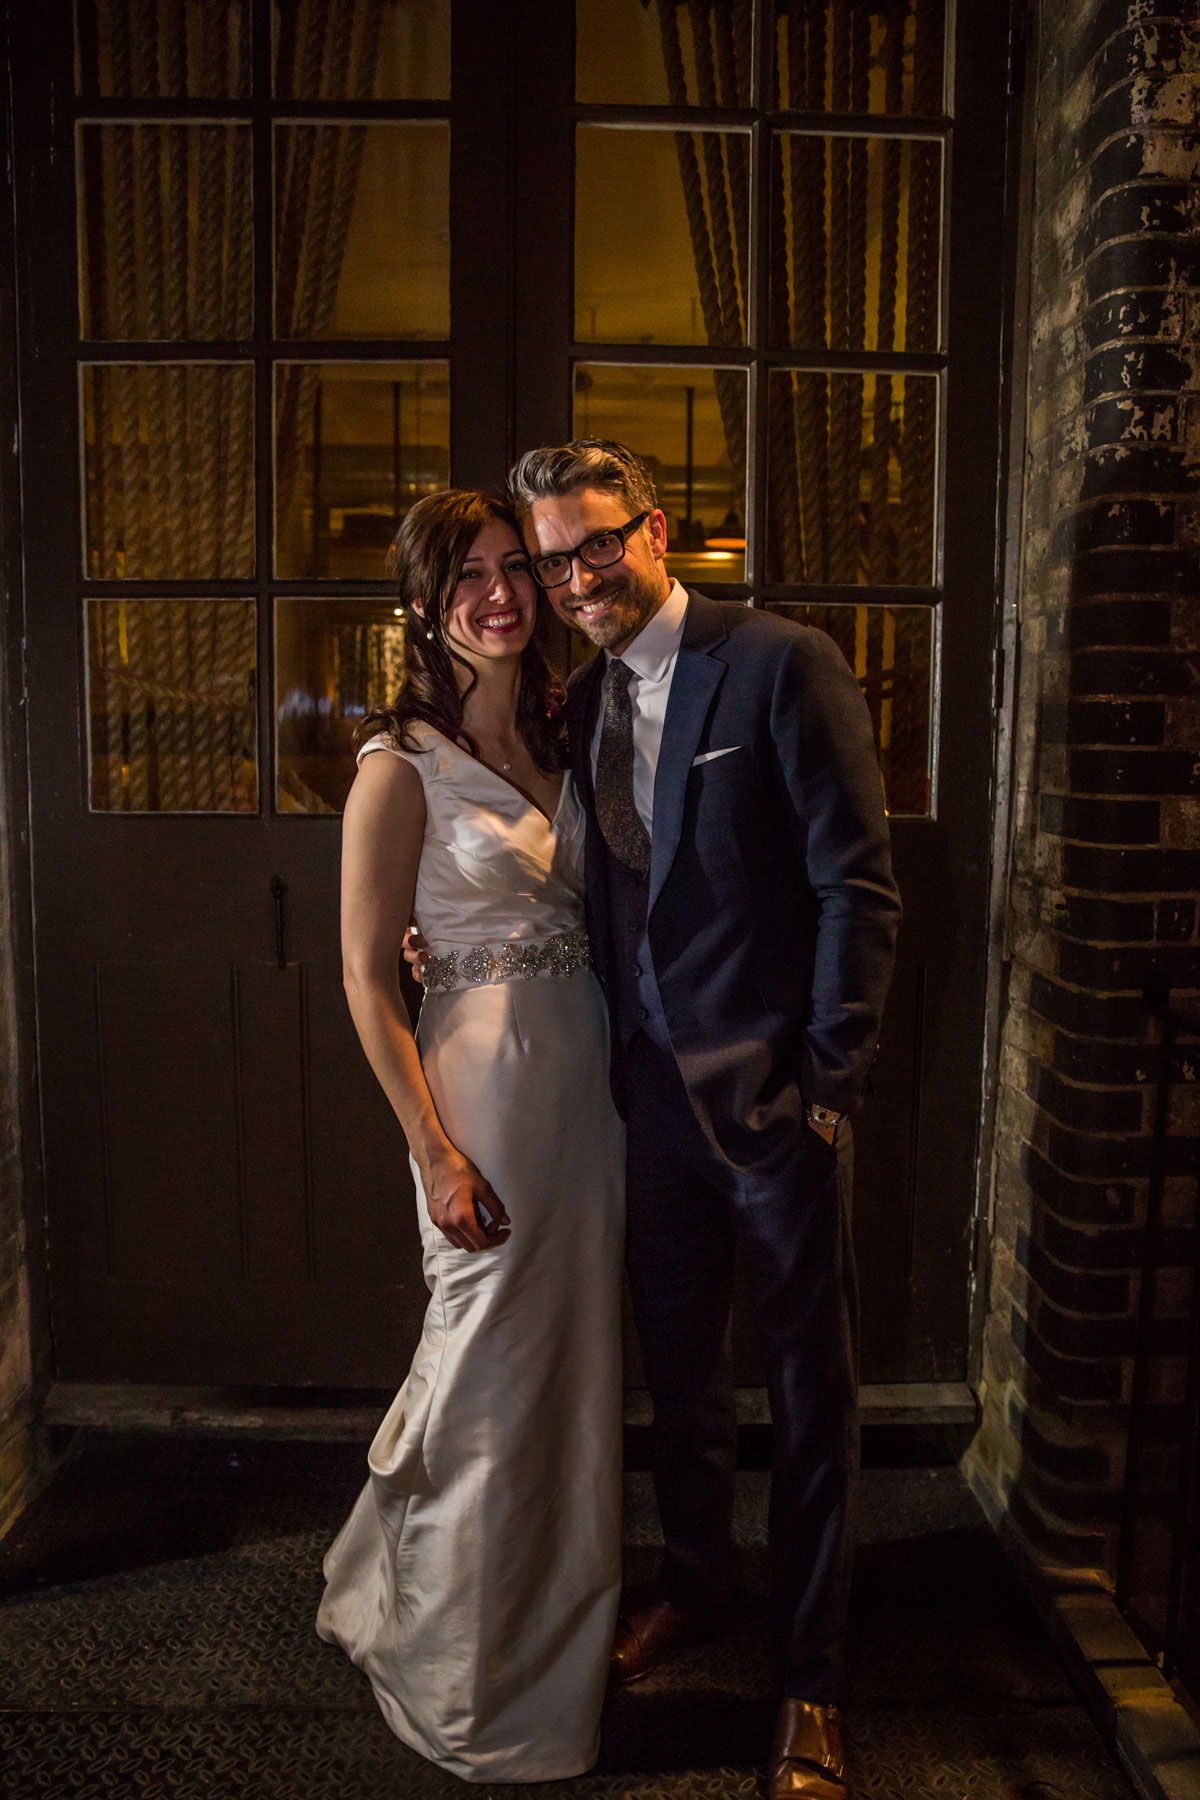 Tanner & Co Wedding Photographer - Richard Murgatroyd Photography